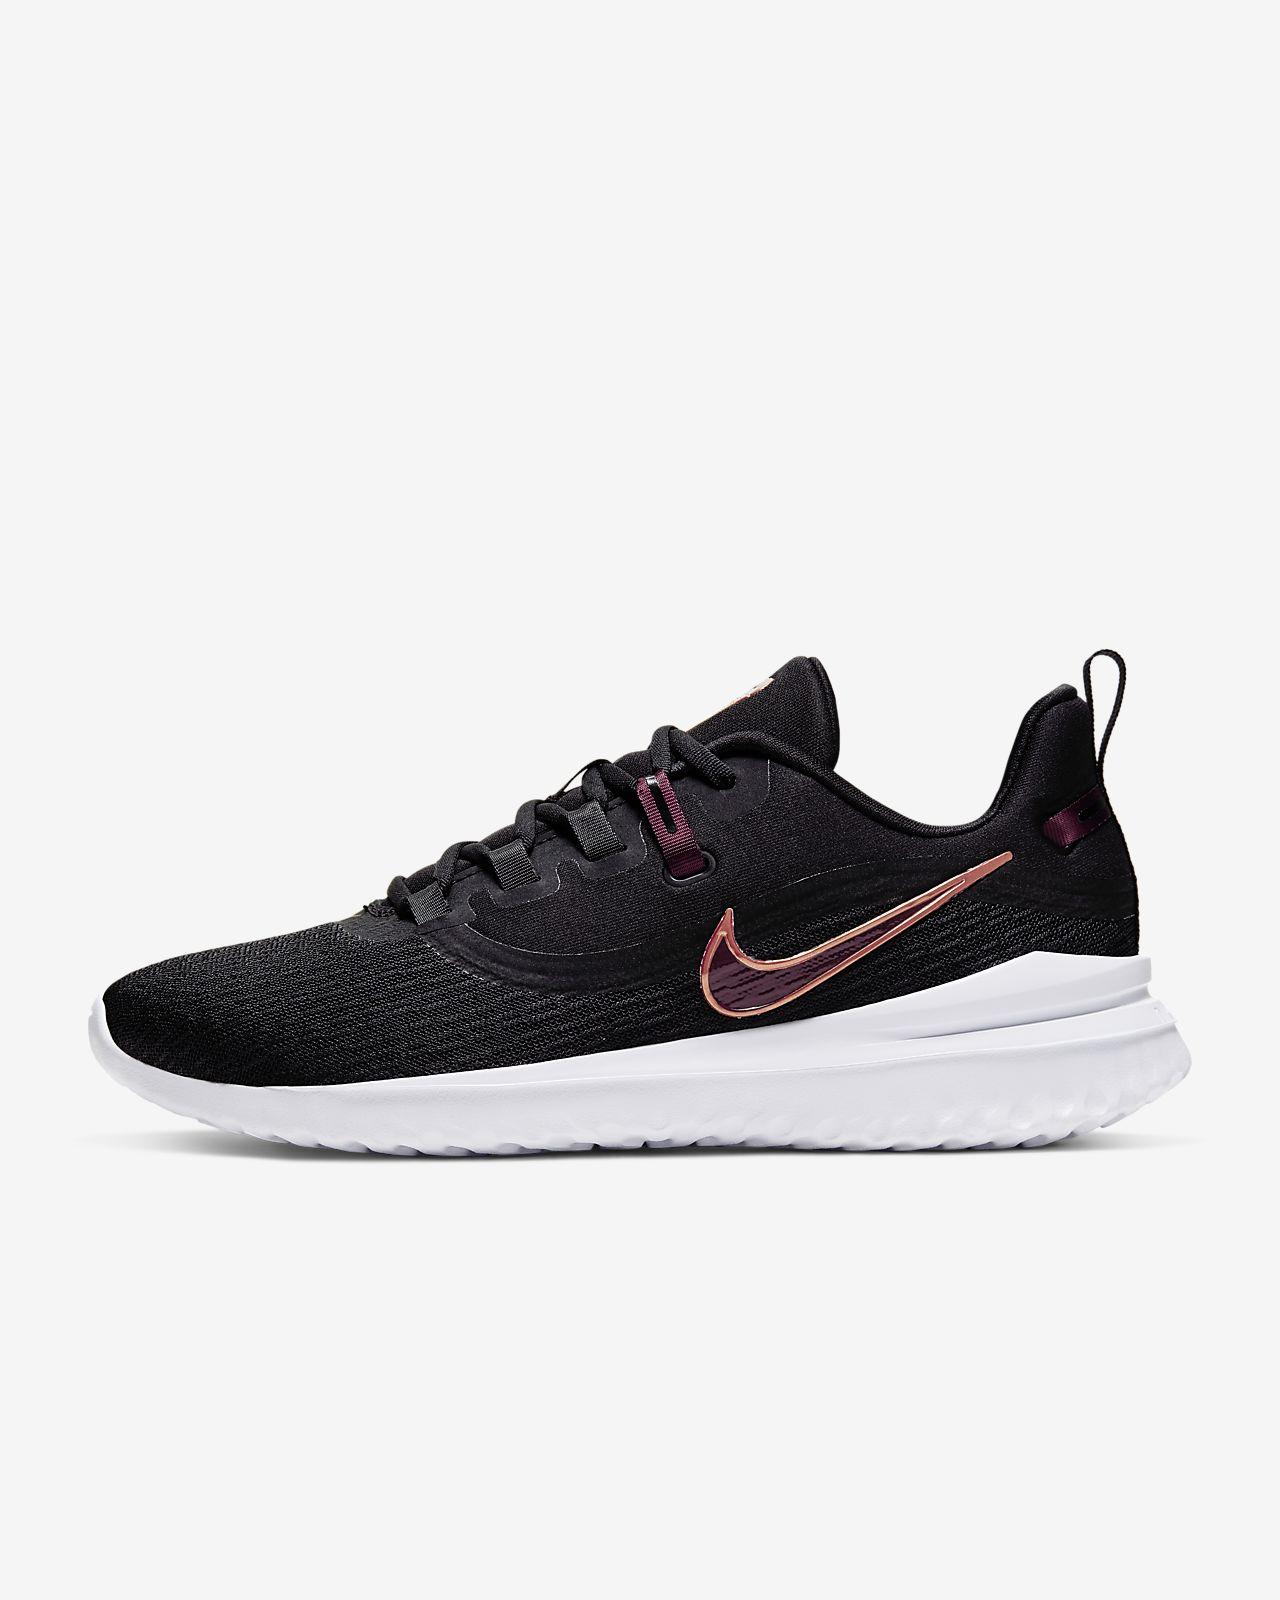 Nike Renew Rival 2 Zapatillas de running - Mujer